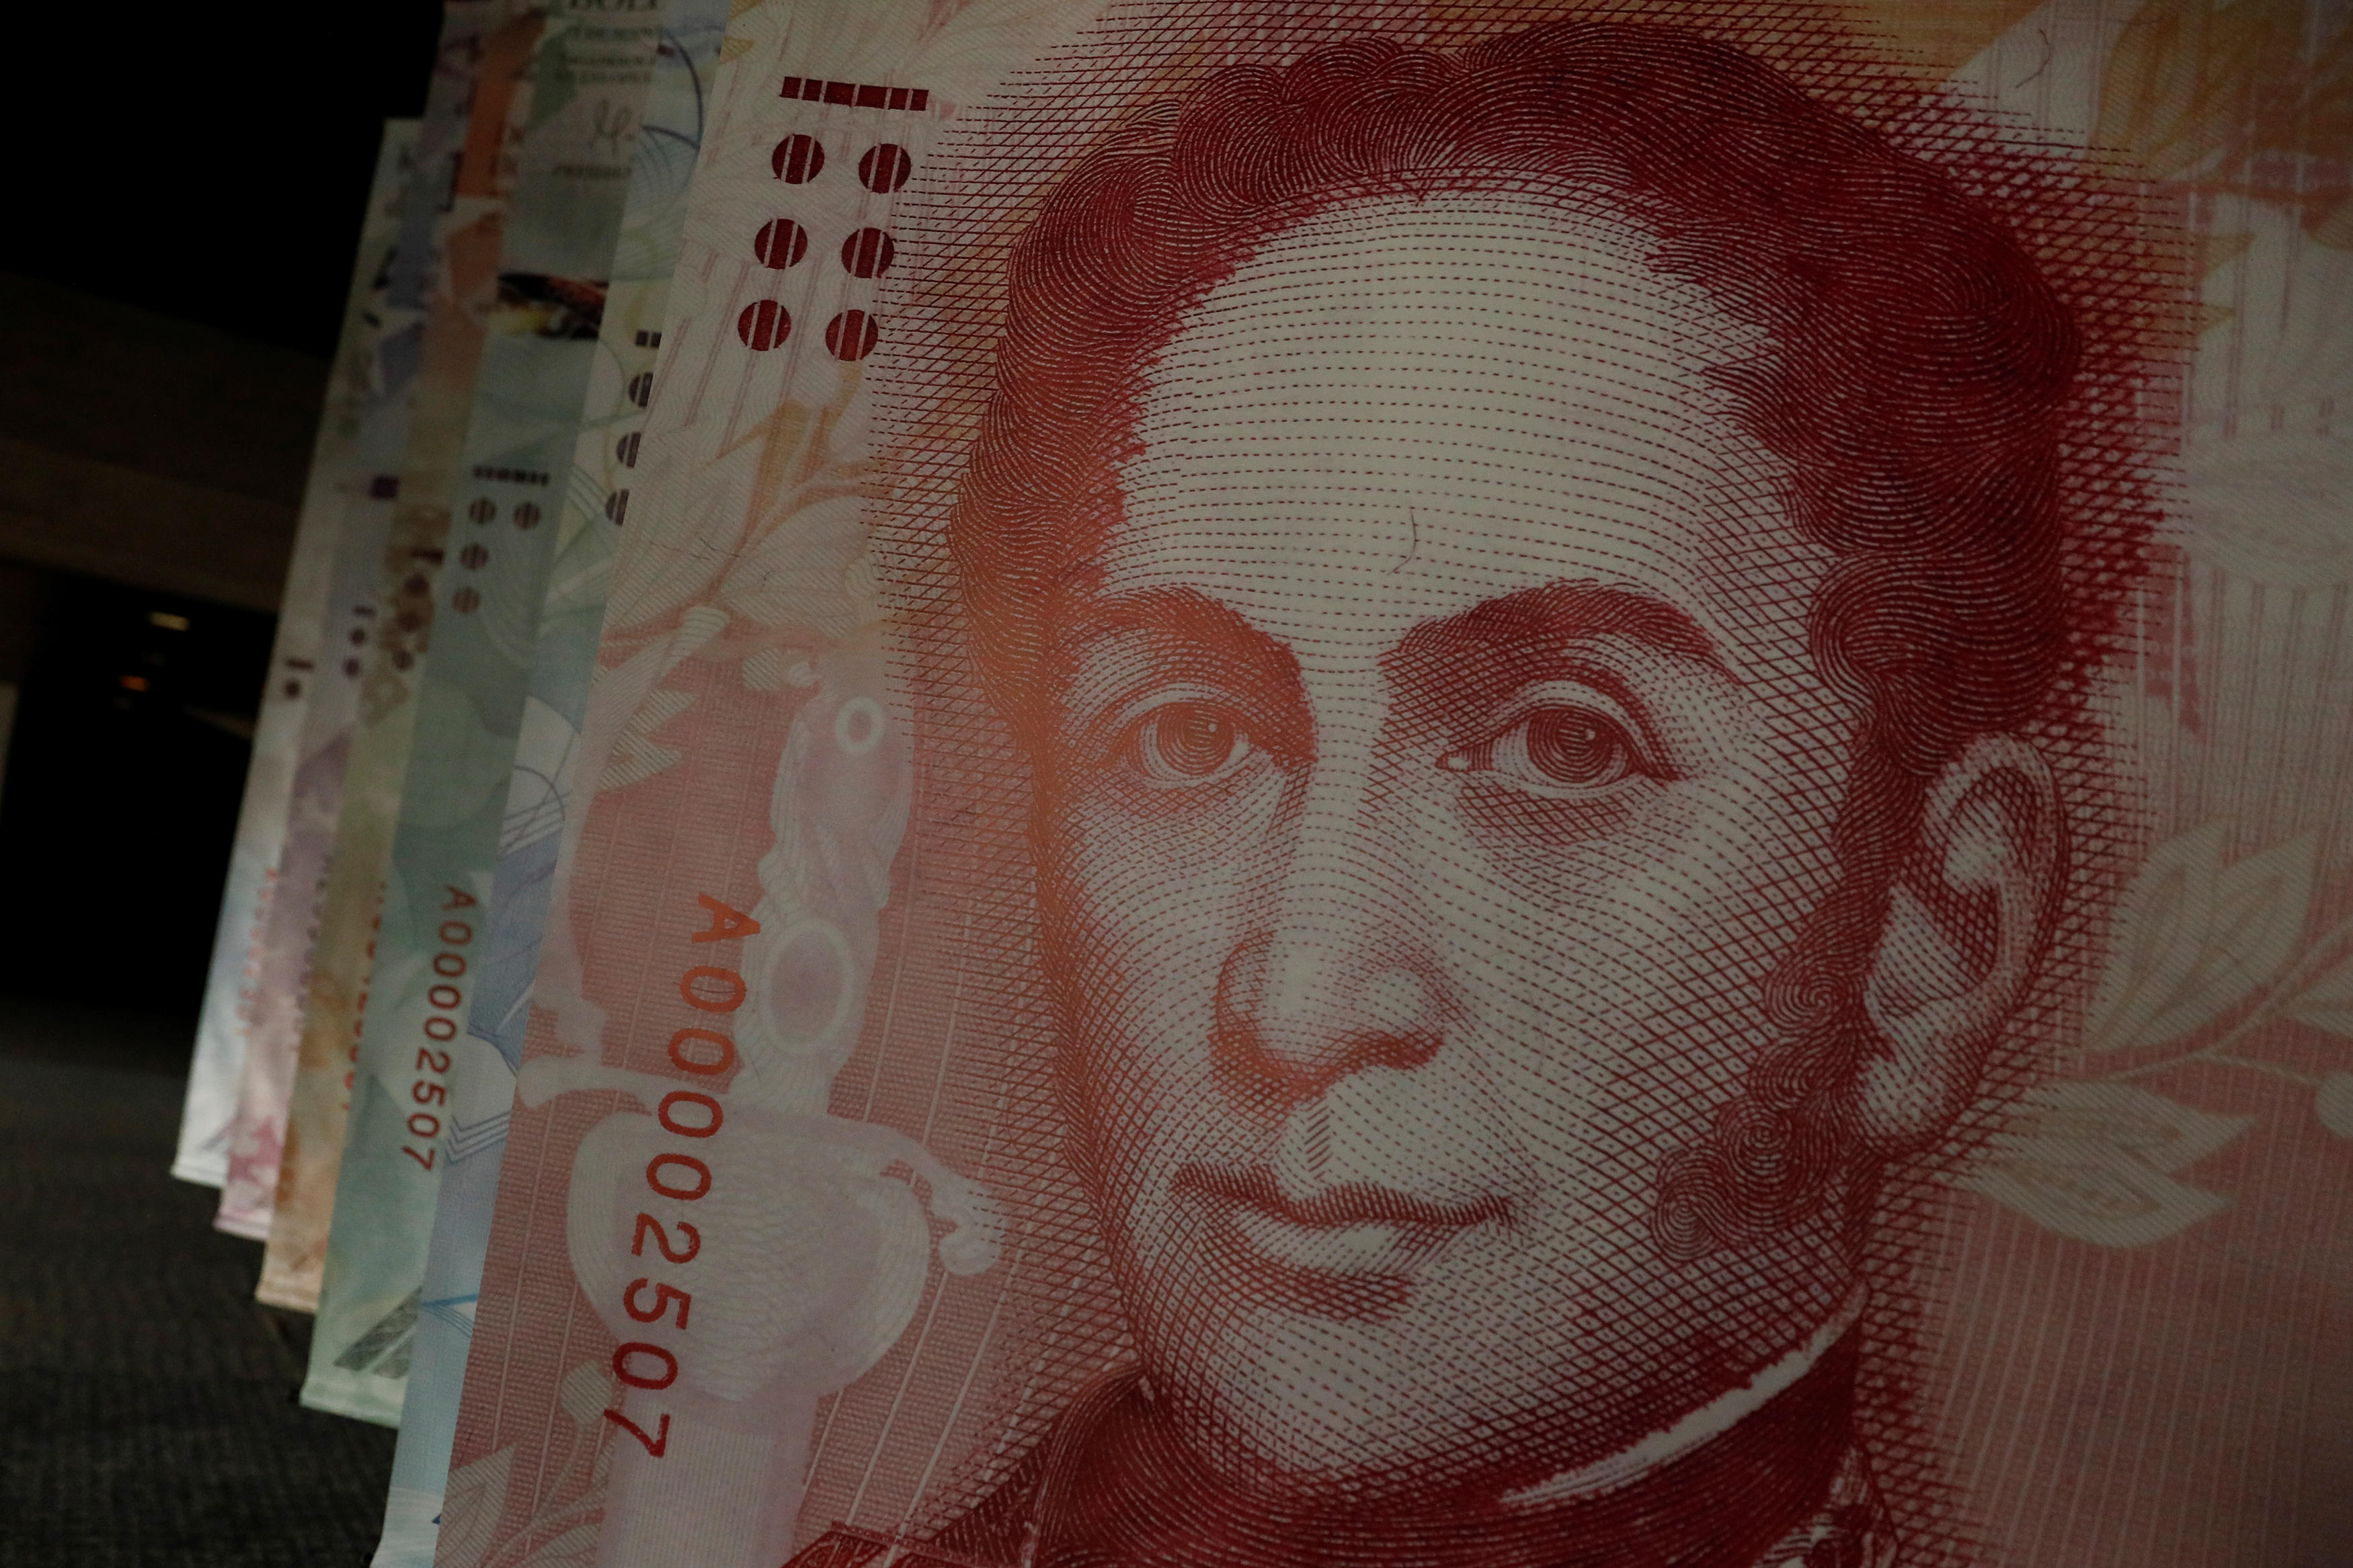 Venezolanos pagan 4 millones de bolívares por un dólar en remesas